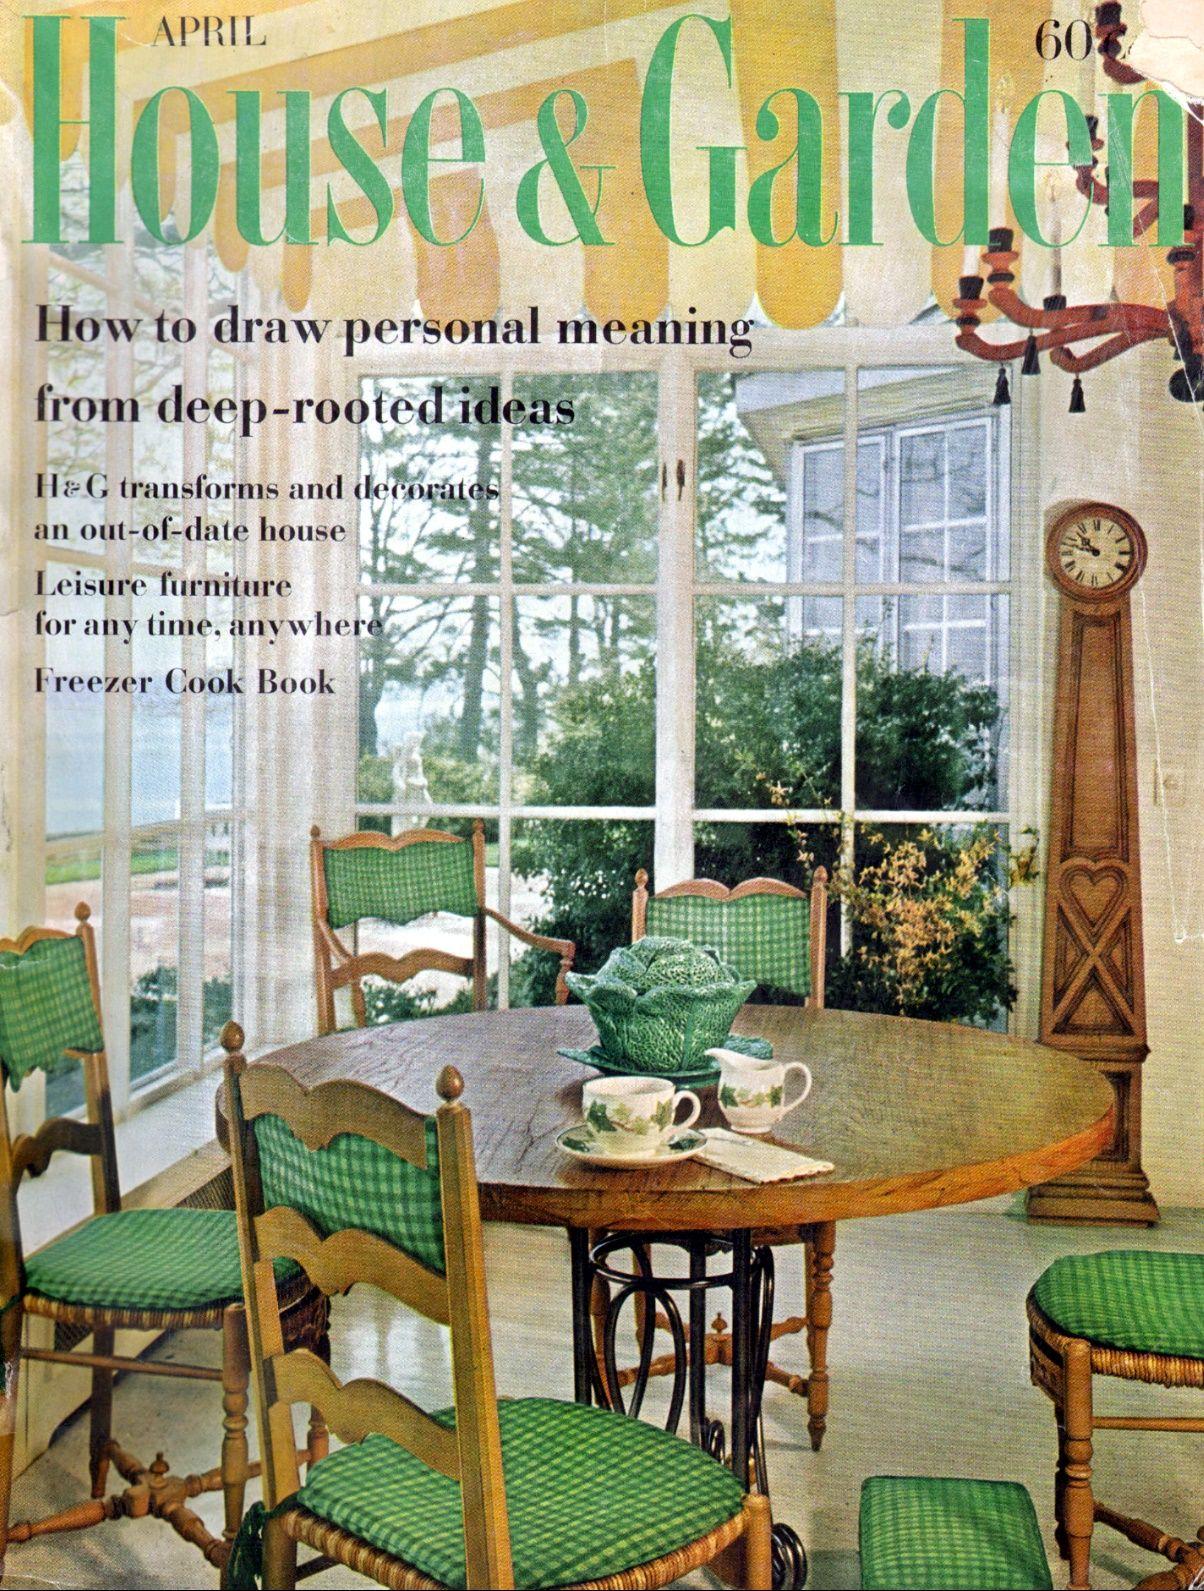 House & Garden - April, 1961 | Outdoor furniture sets ...